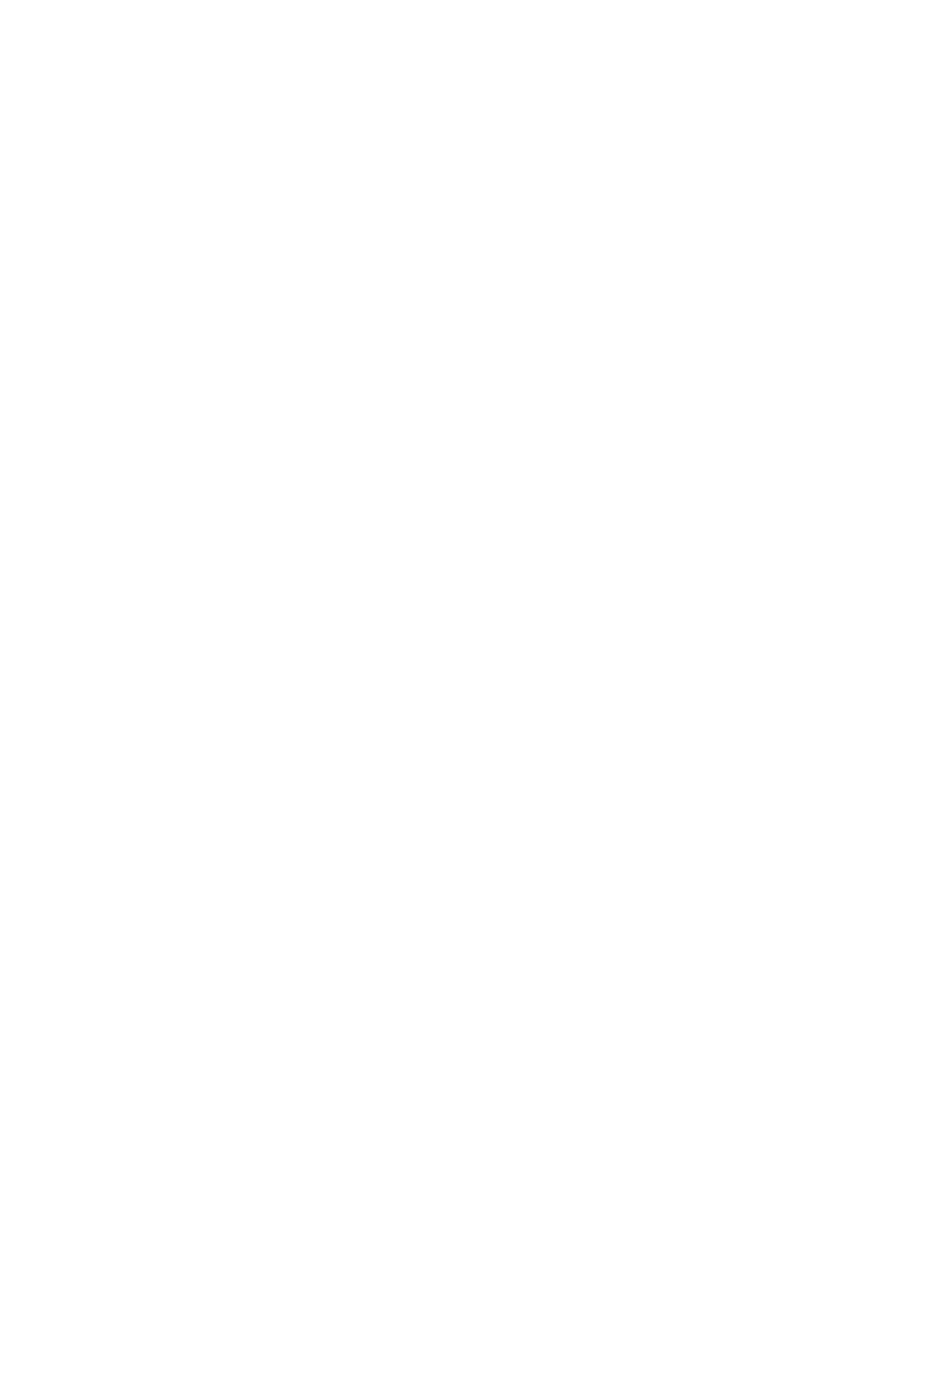 Share-share-earn-give-white